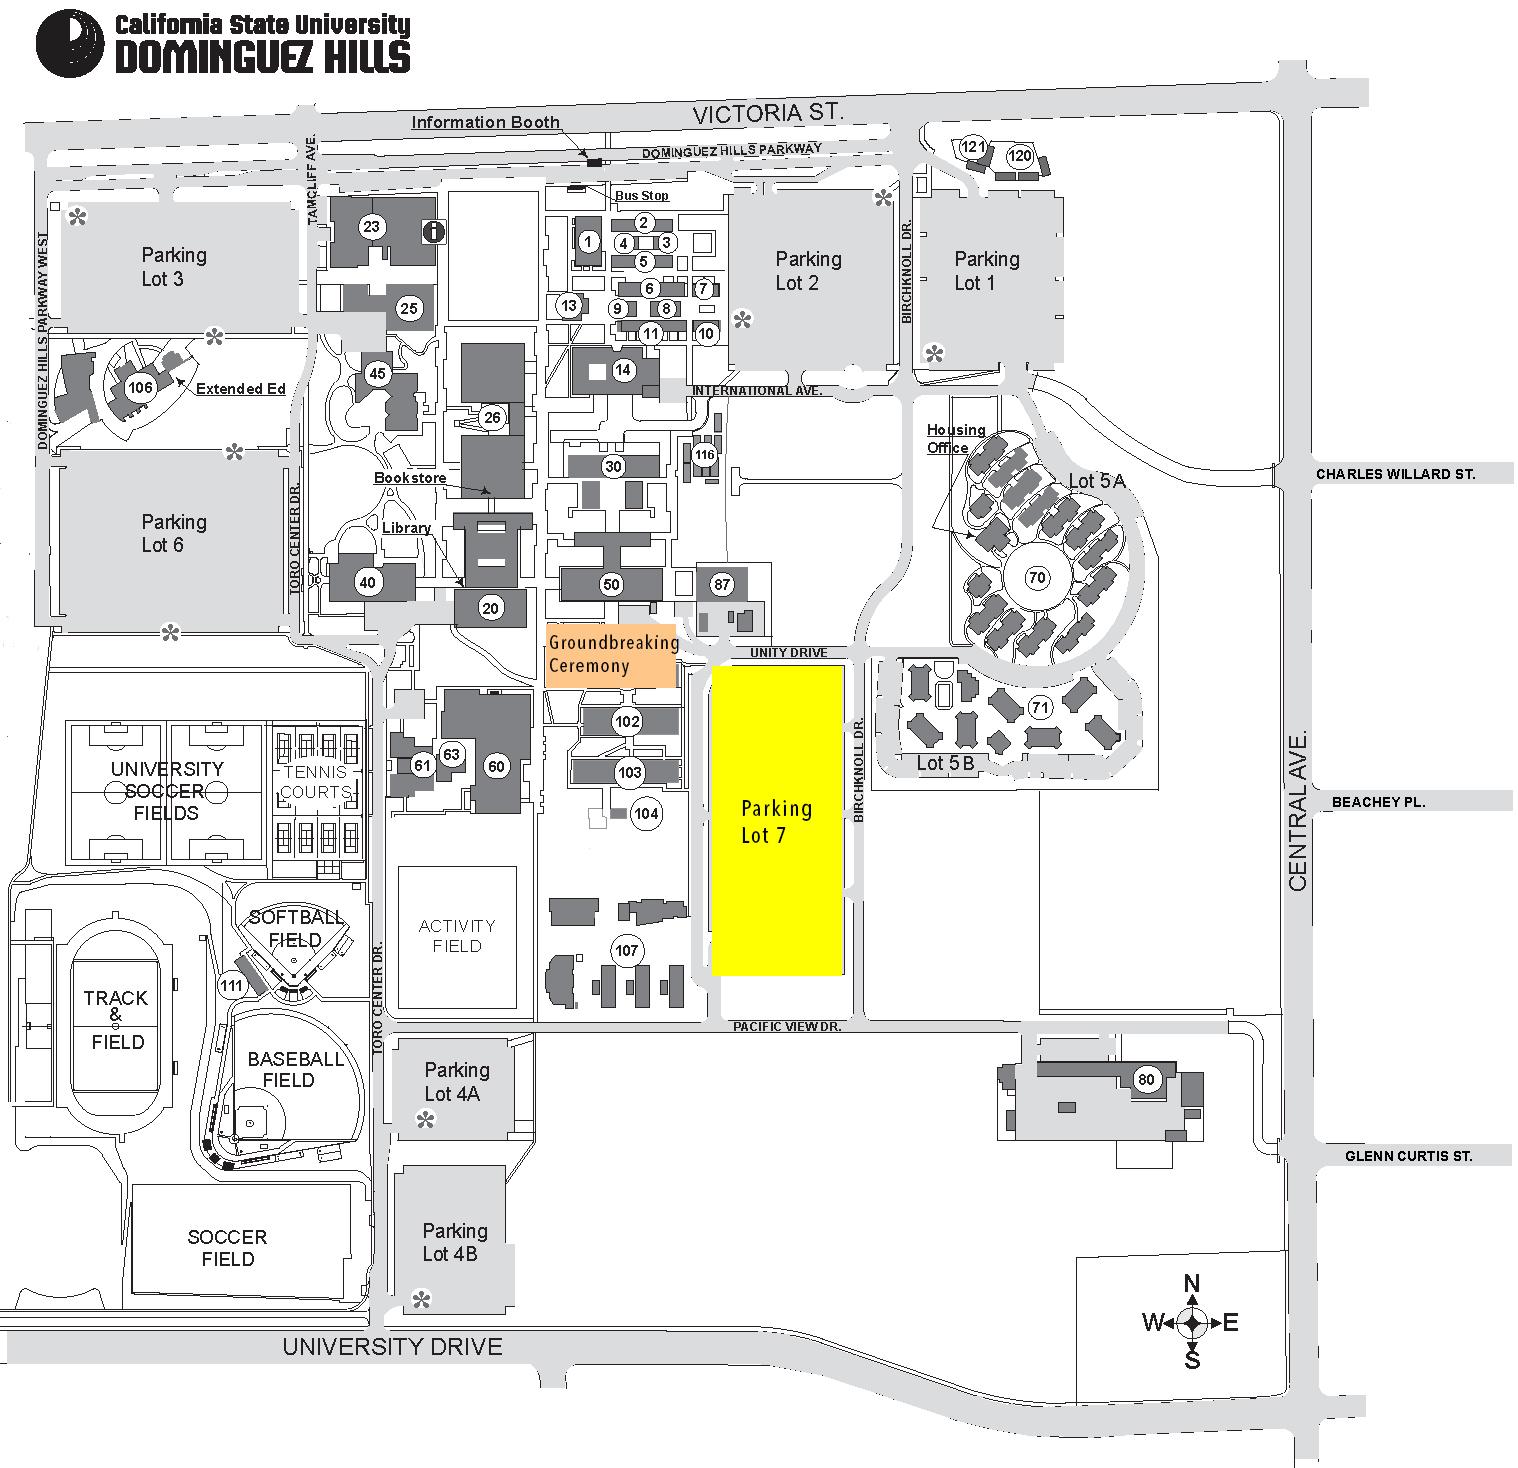 CSUDH Map Lot 7